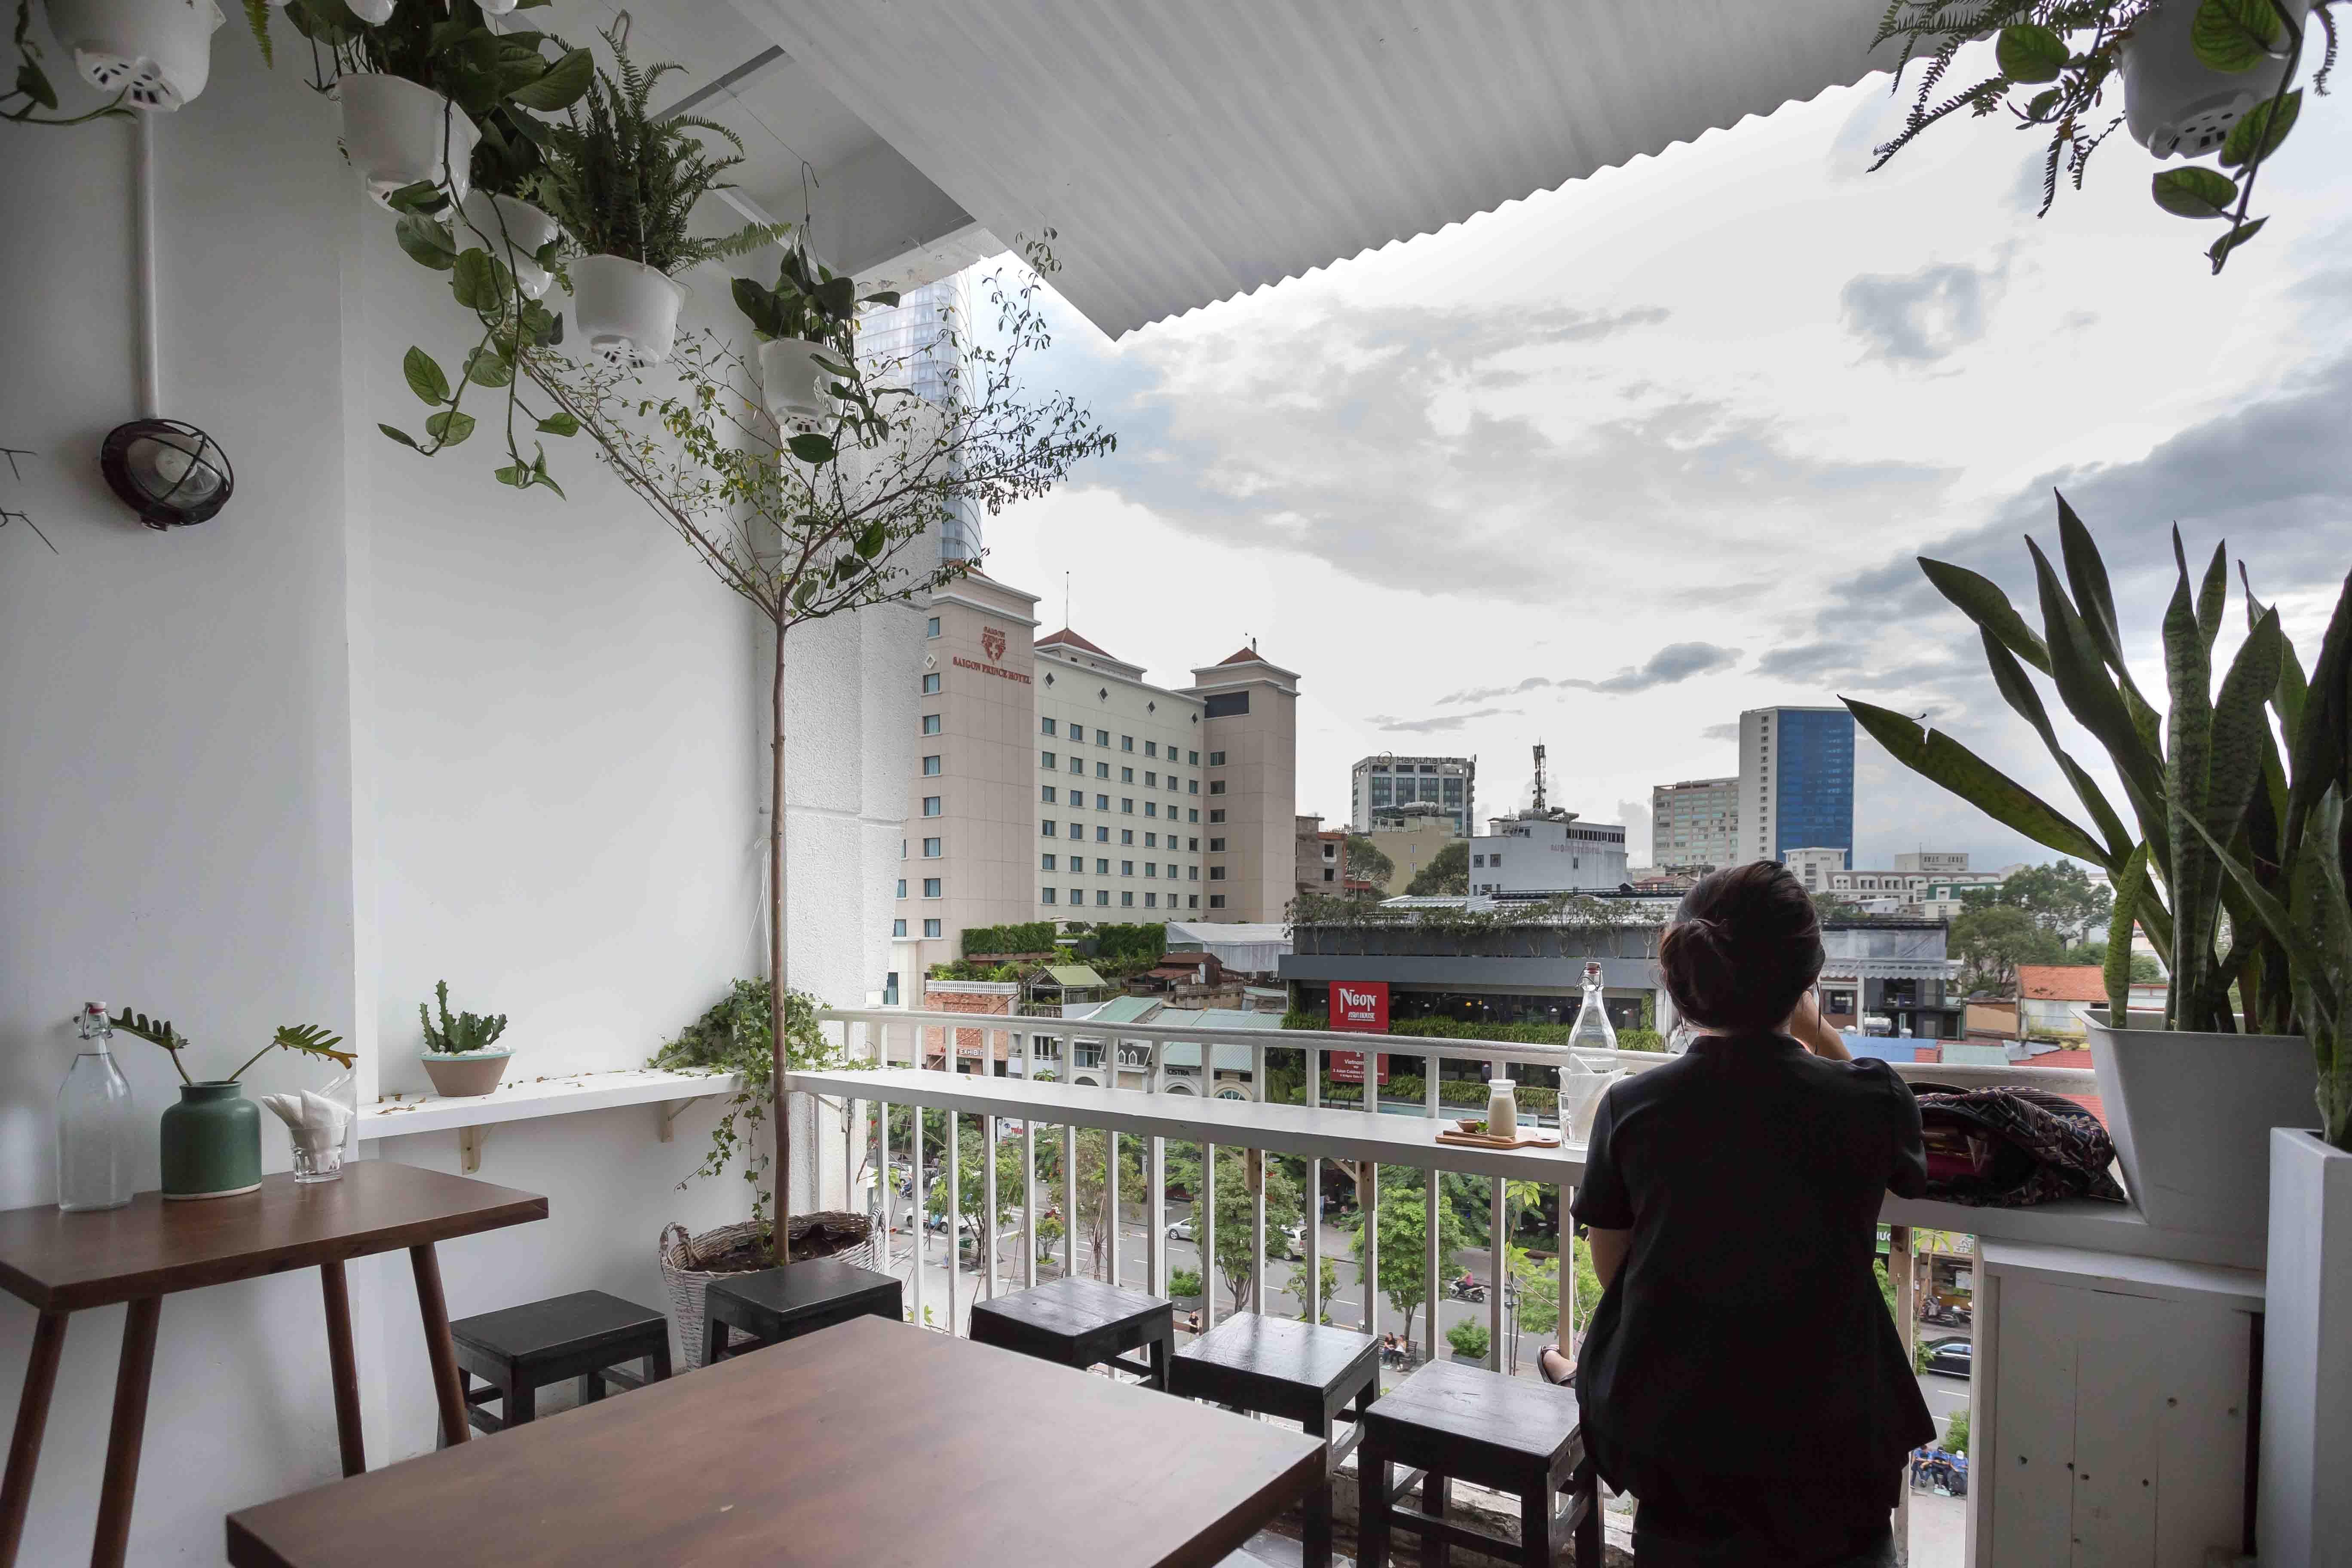 Cafe Hopping Best Cafes In Saigon Cool Cafe Saigon Cafe House